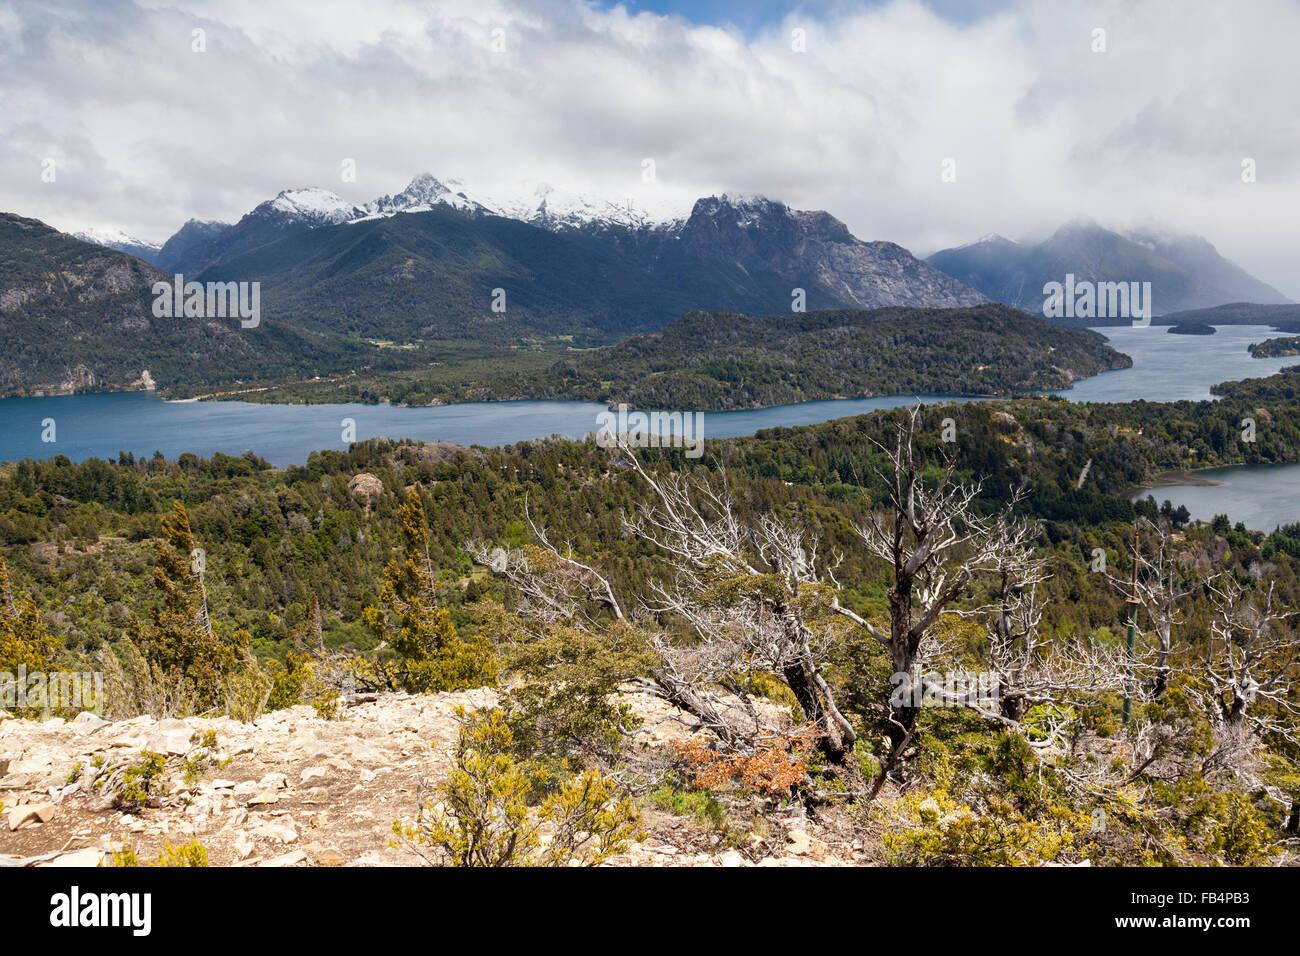 Lake Nahuel Huapi, Parque Nacional Nahuel Huapi National Park, lake region, near Bariloche, Patagonia, Argentina, - Stock Image